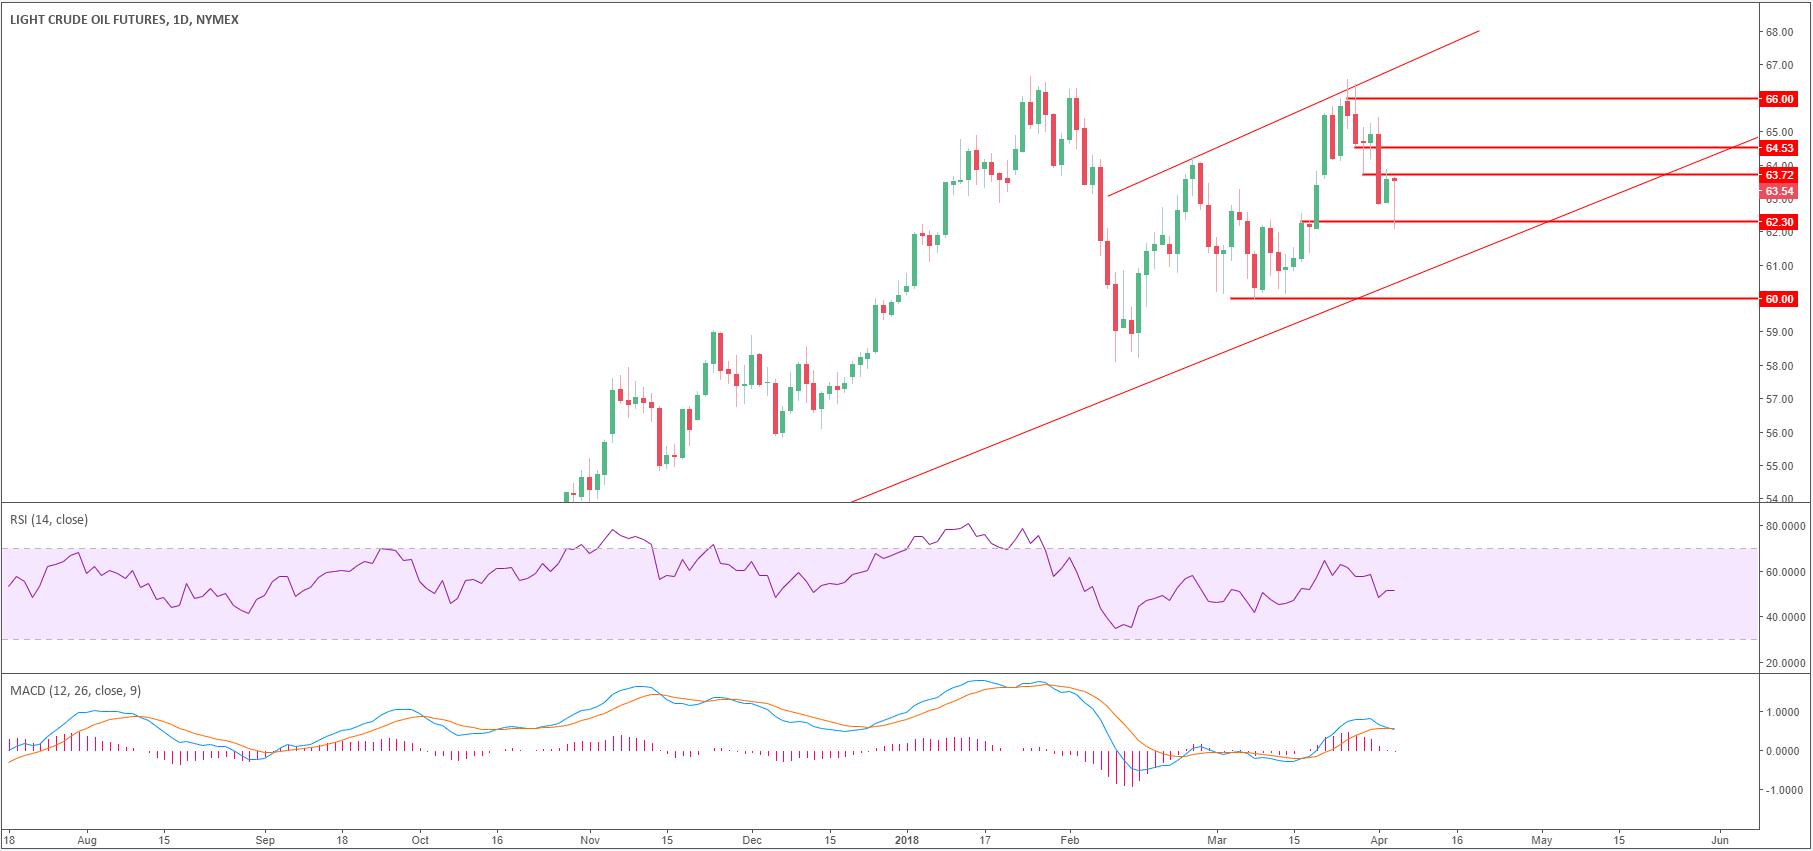 Crude oil WTI bulls are looking at $64 50 amid Wall Street optimism